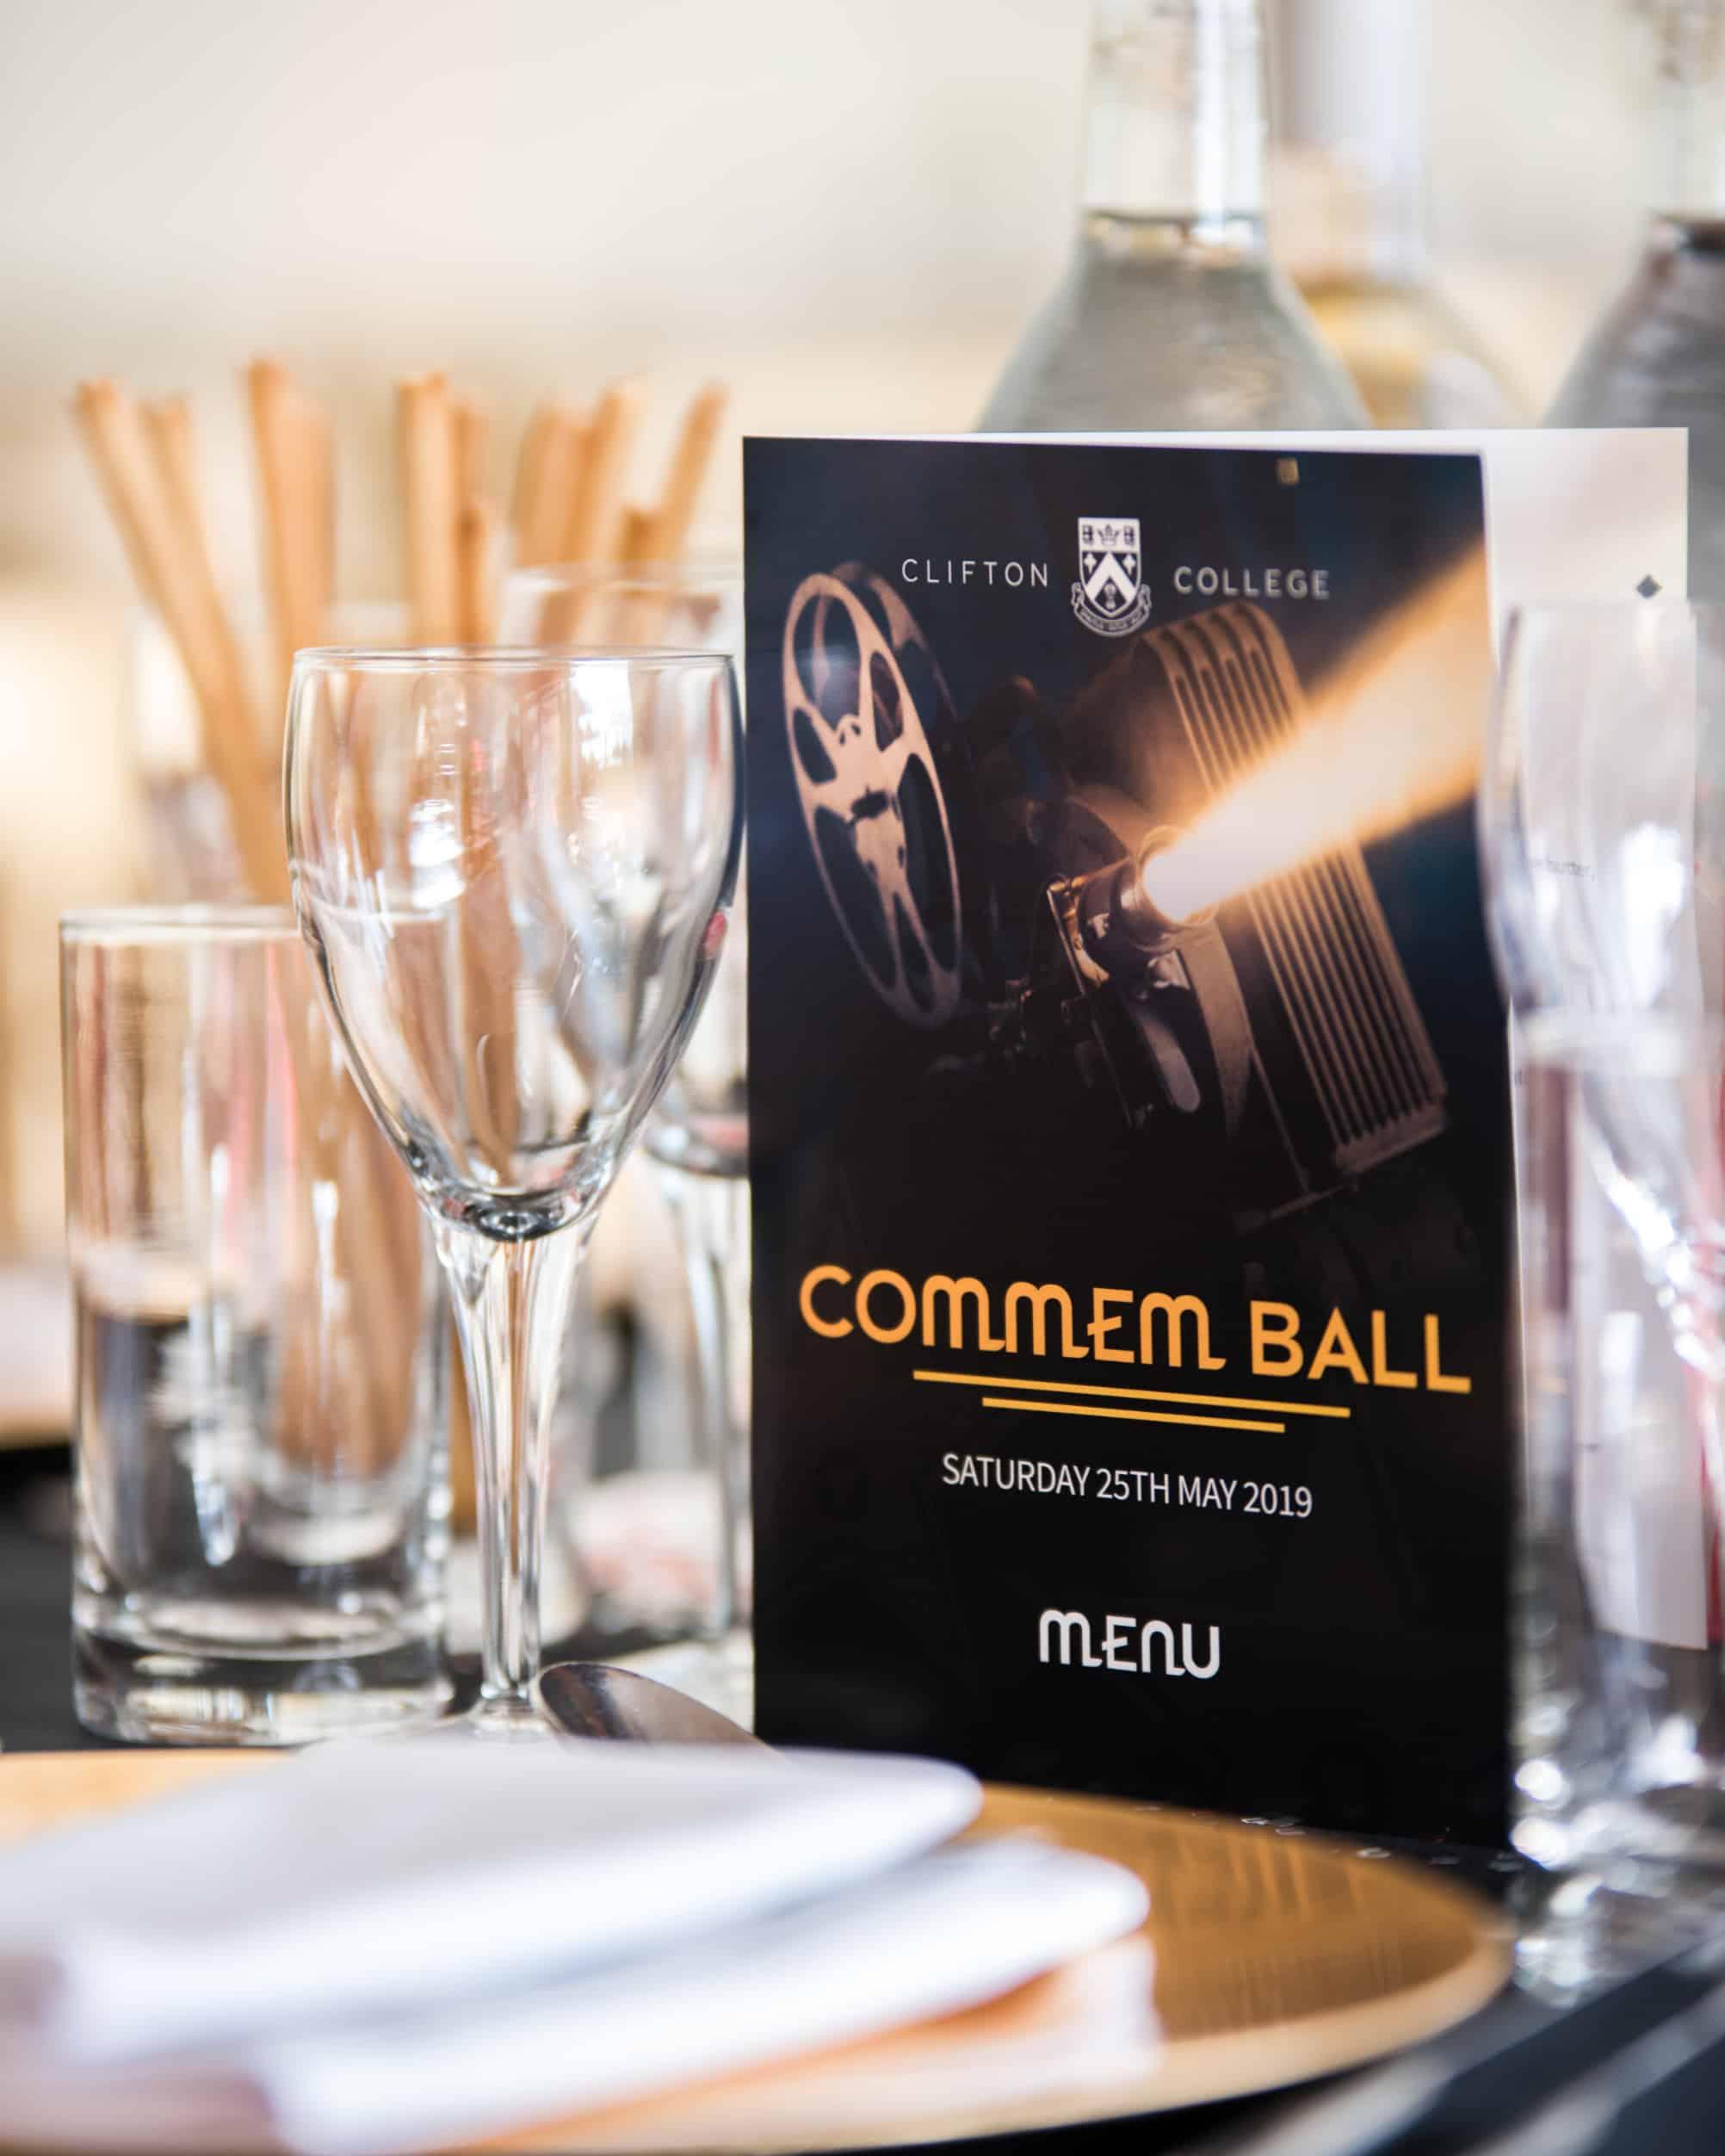 Clifton College commem ball menus